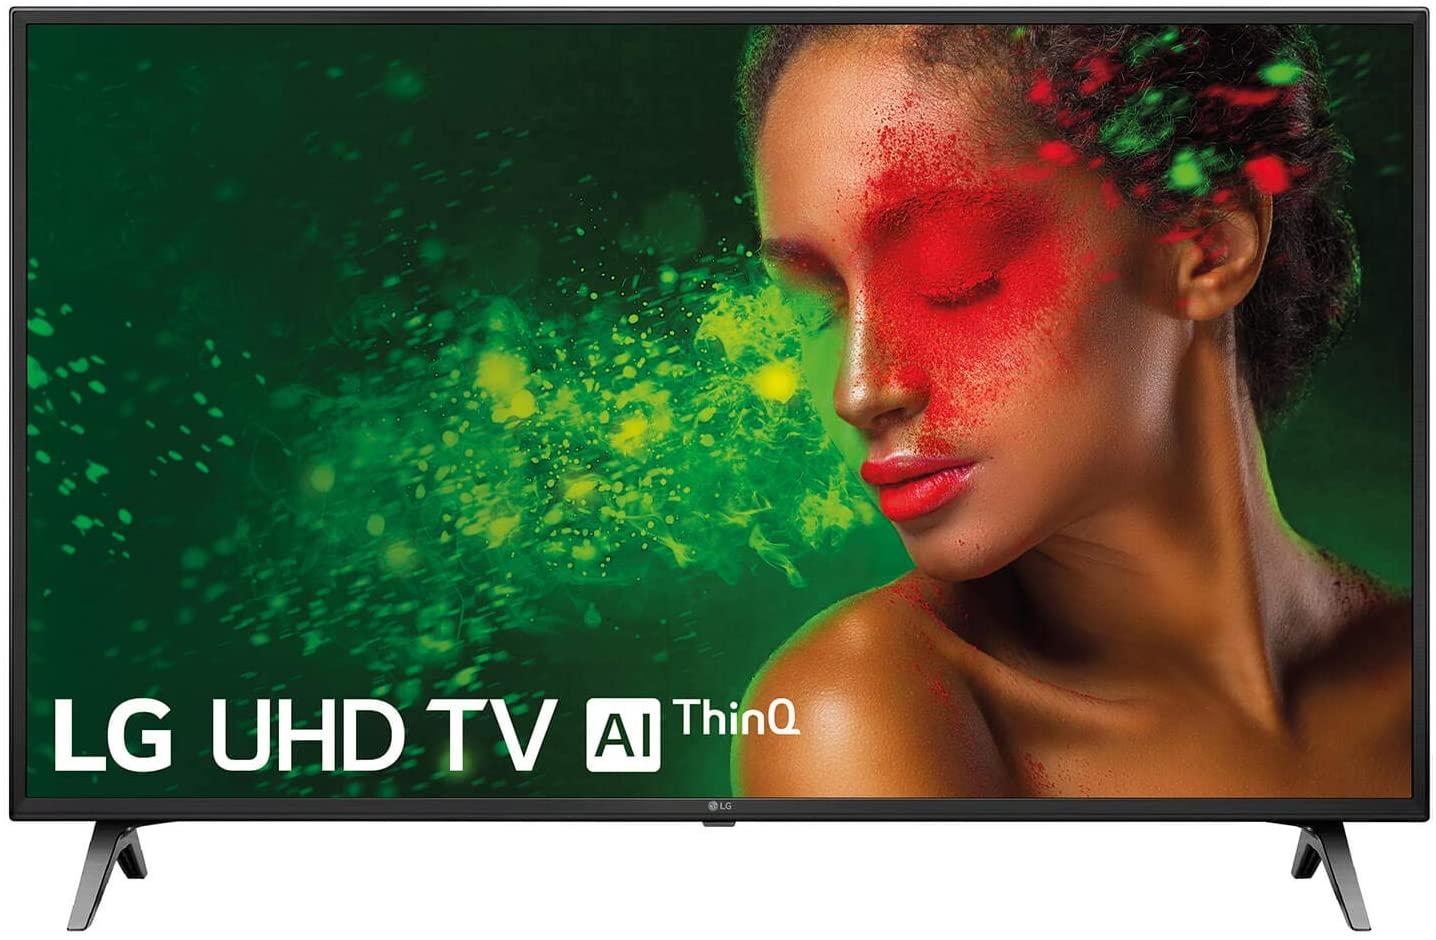 "LG 55UM7100ALEXA - Smart TV 4K UHD de 139 cm (55"") Works With Alexa (procesador Quad Core, HDR y Sonido Ultra Surround) color negro"